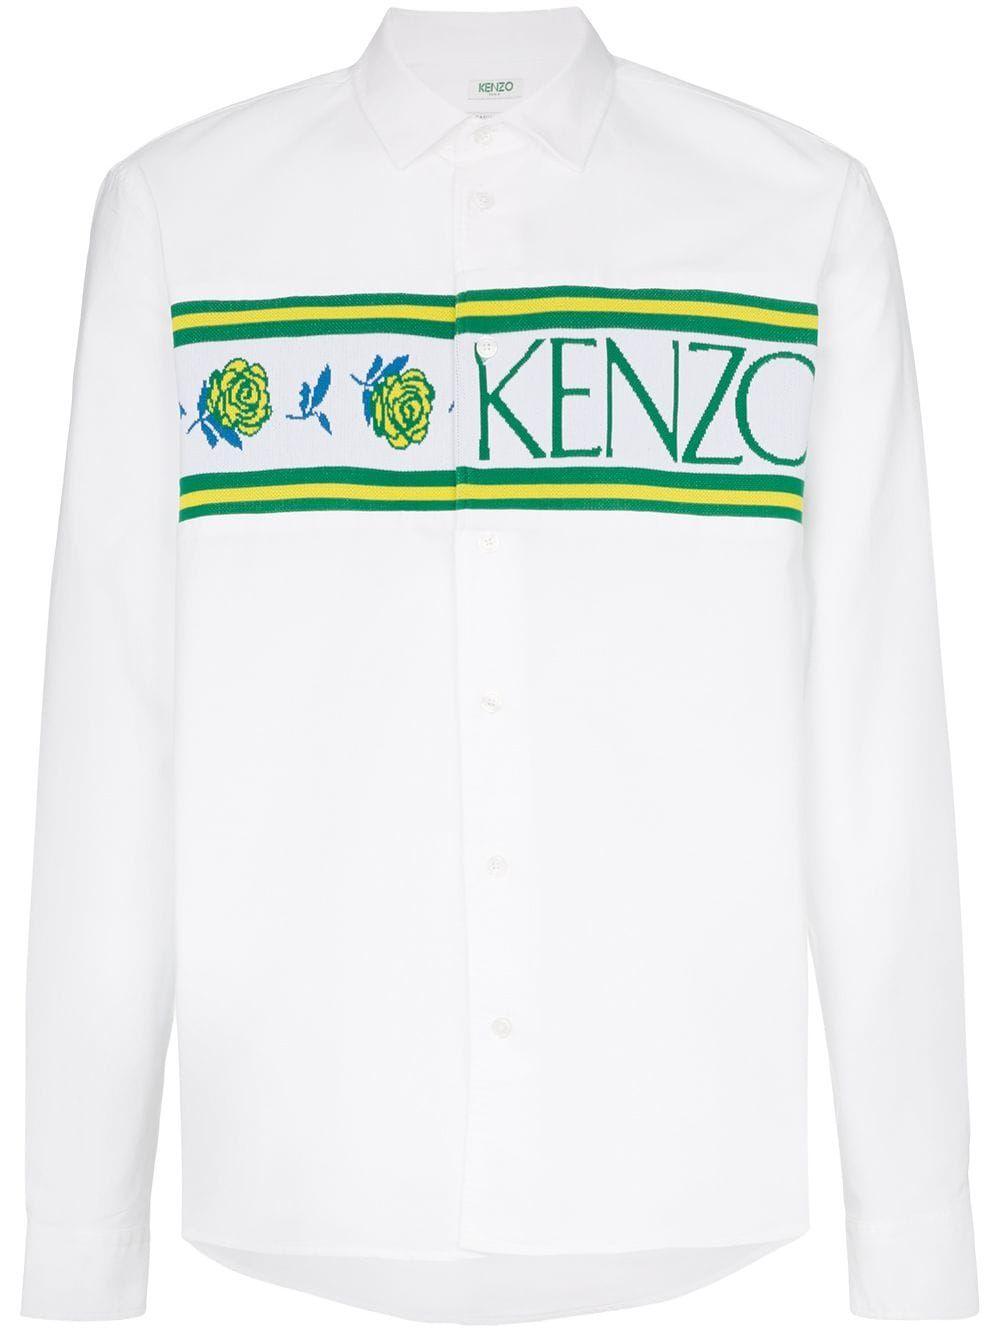 3878ec3d KENZO KENZO KNITTED LOGO PANEL COTTON SHIRT - WHITE. #kenzo #cloth ...